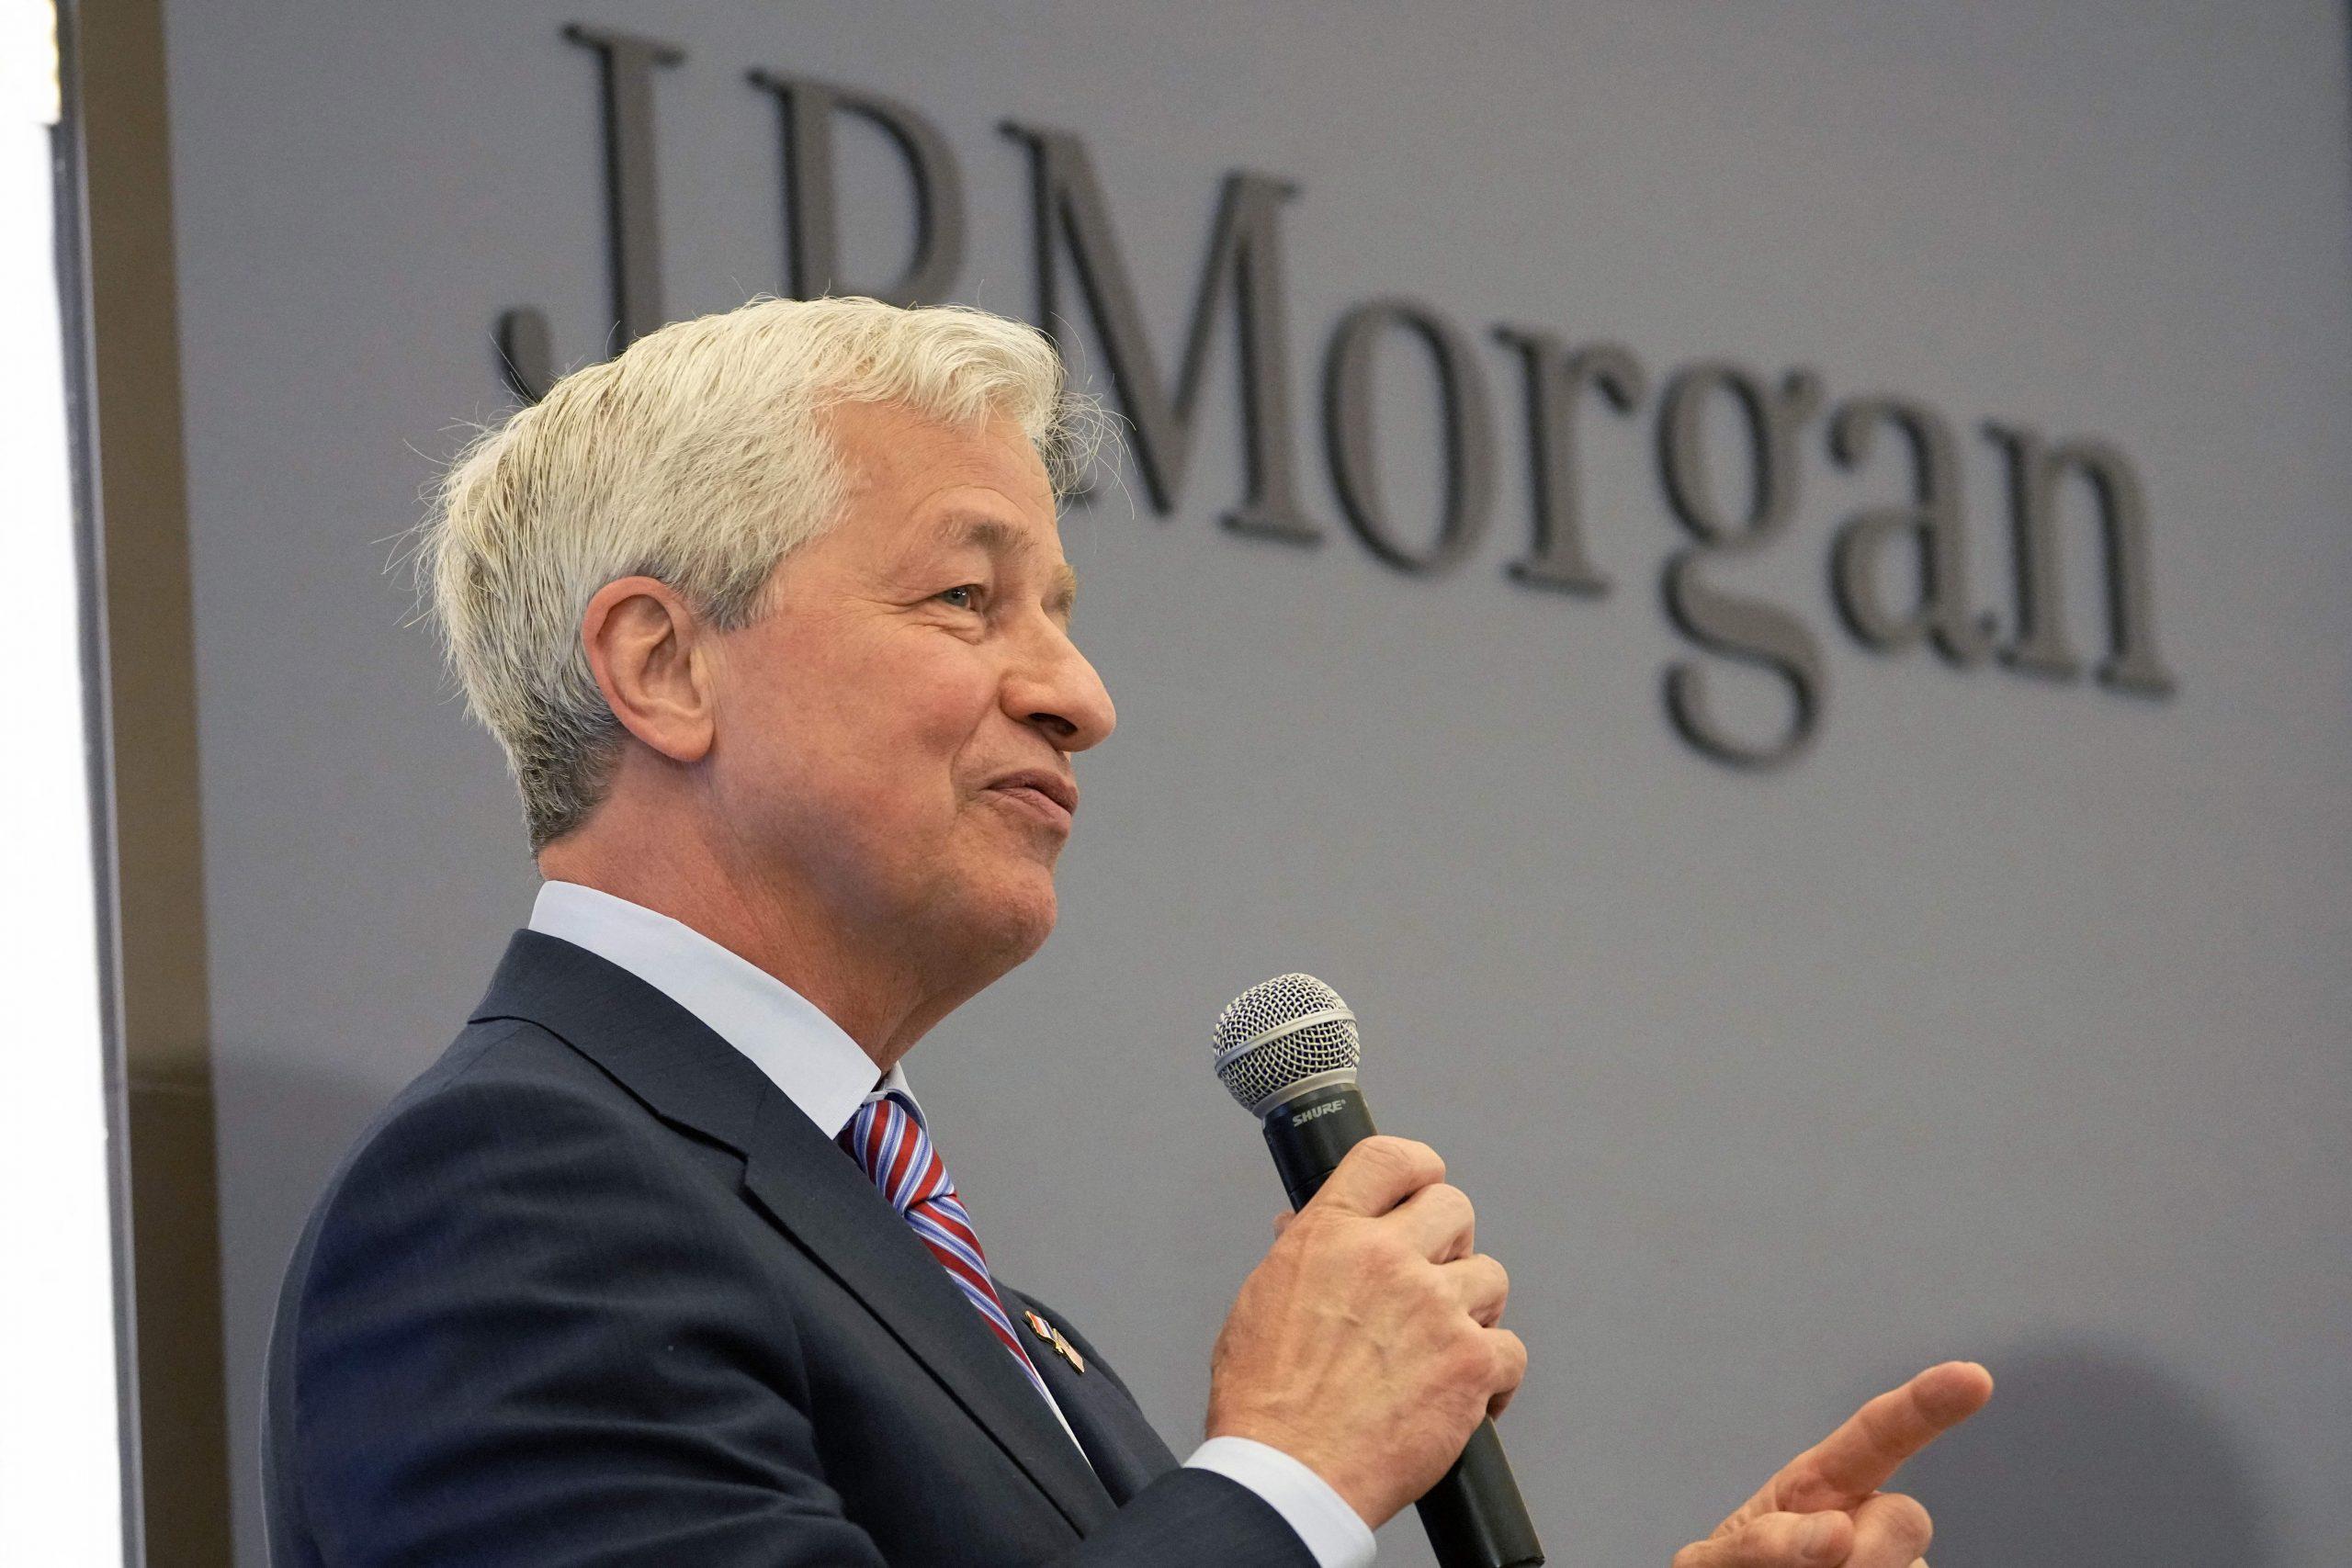 JPMorgan gives Jamie Dimon special stock option bonus to keep him CEO